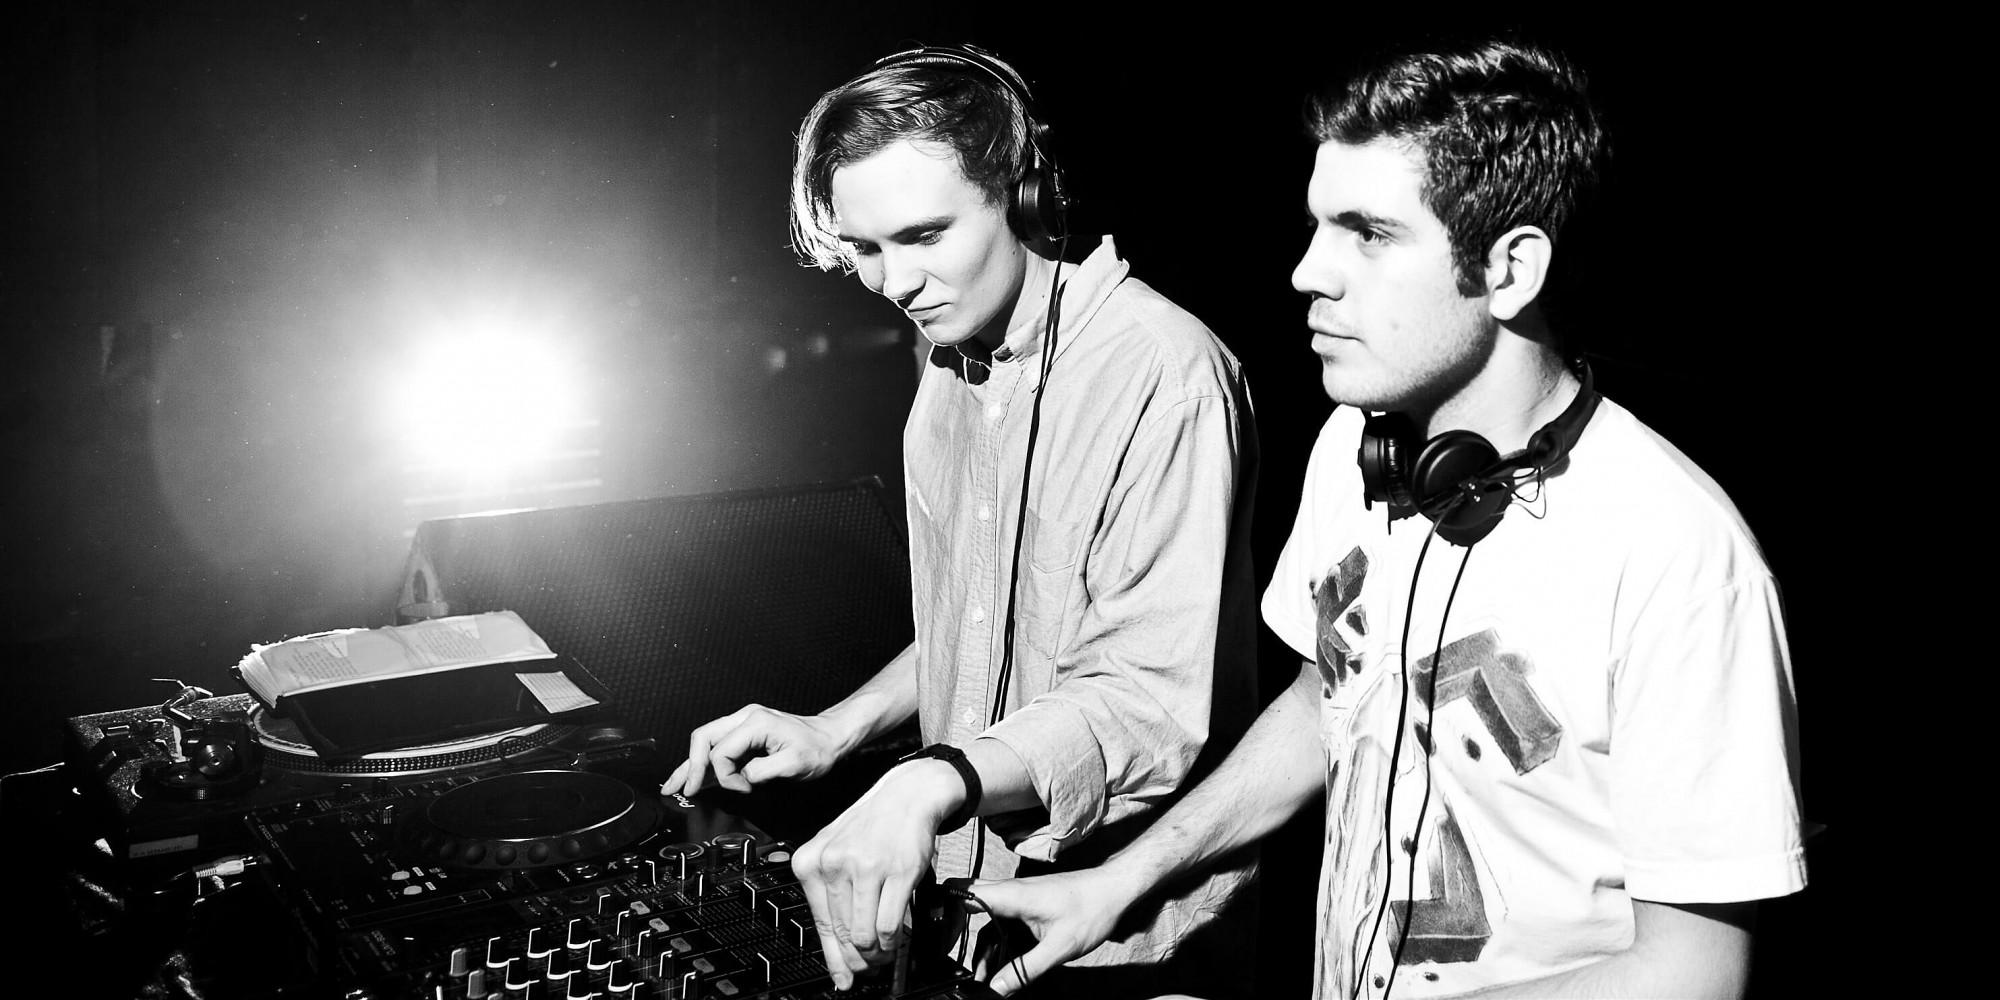 Mixed Frequency - David Sousa & Mads Schmidt